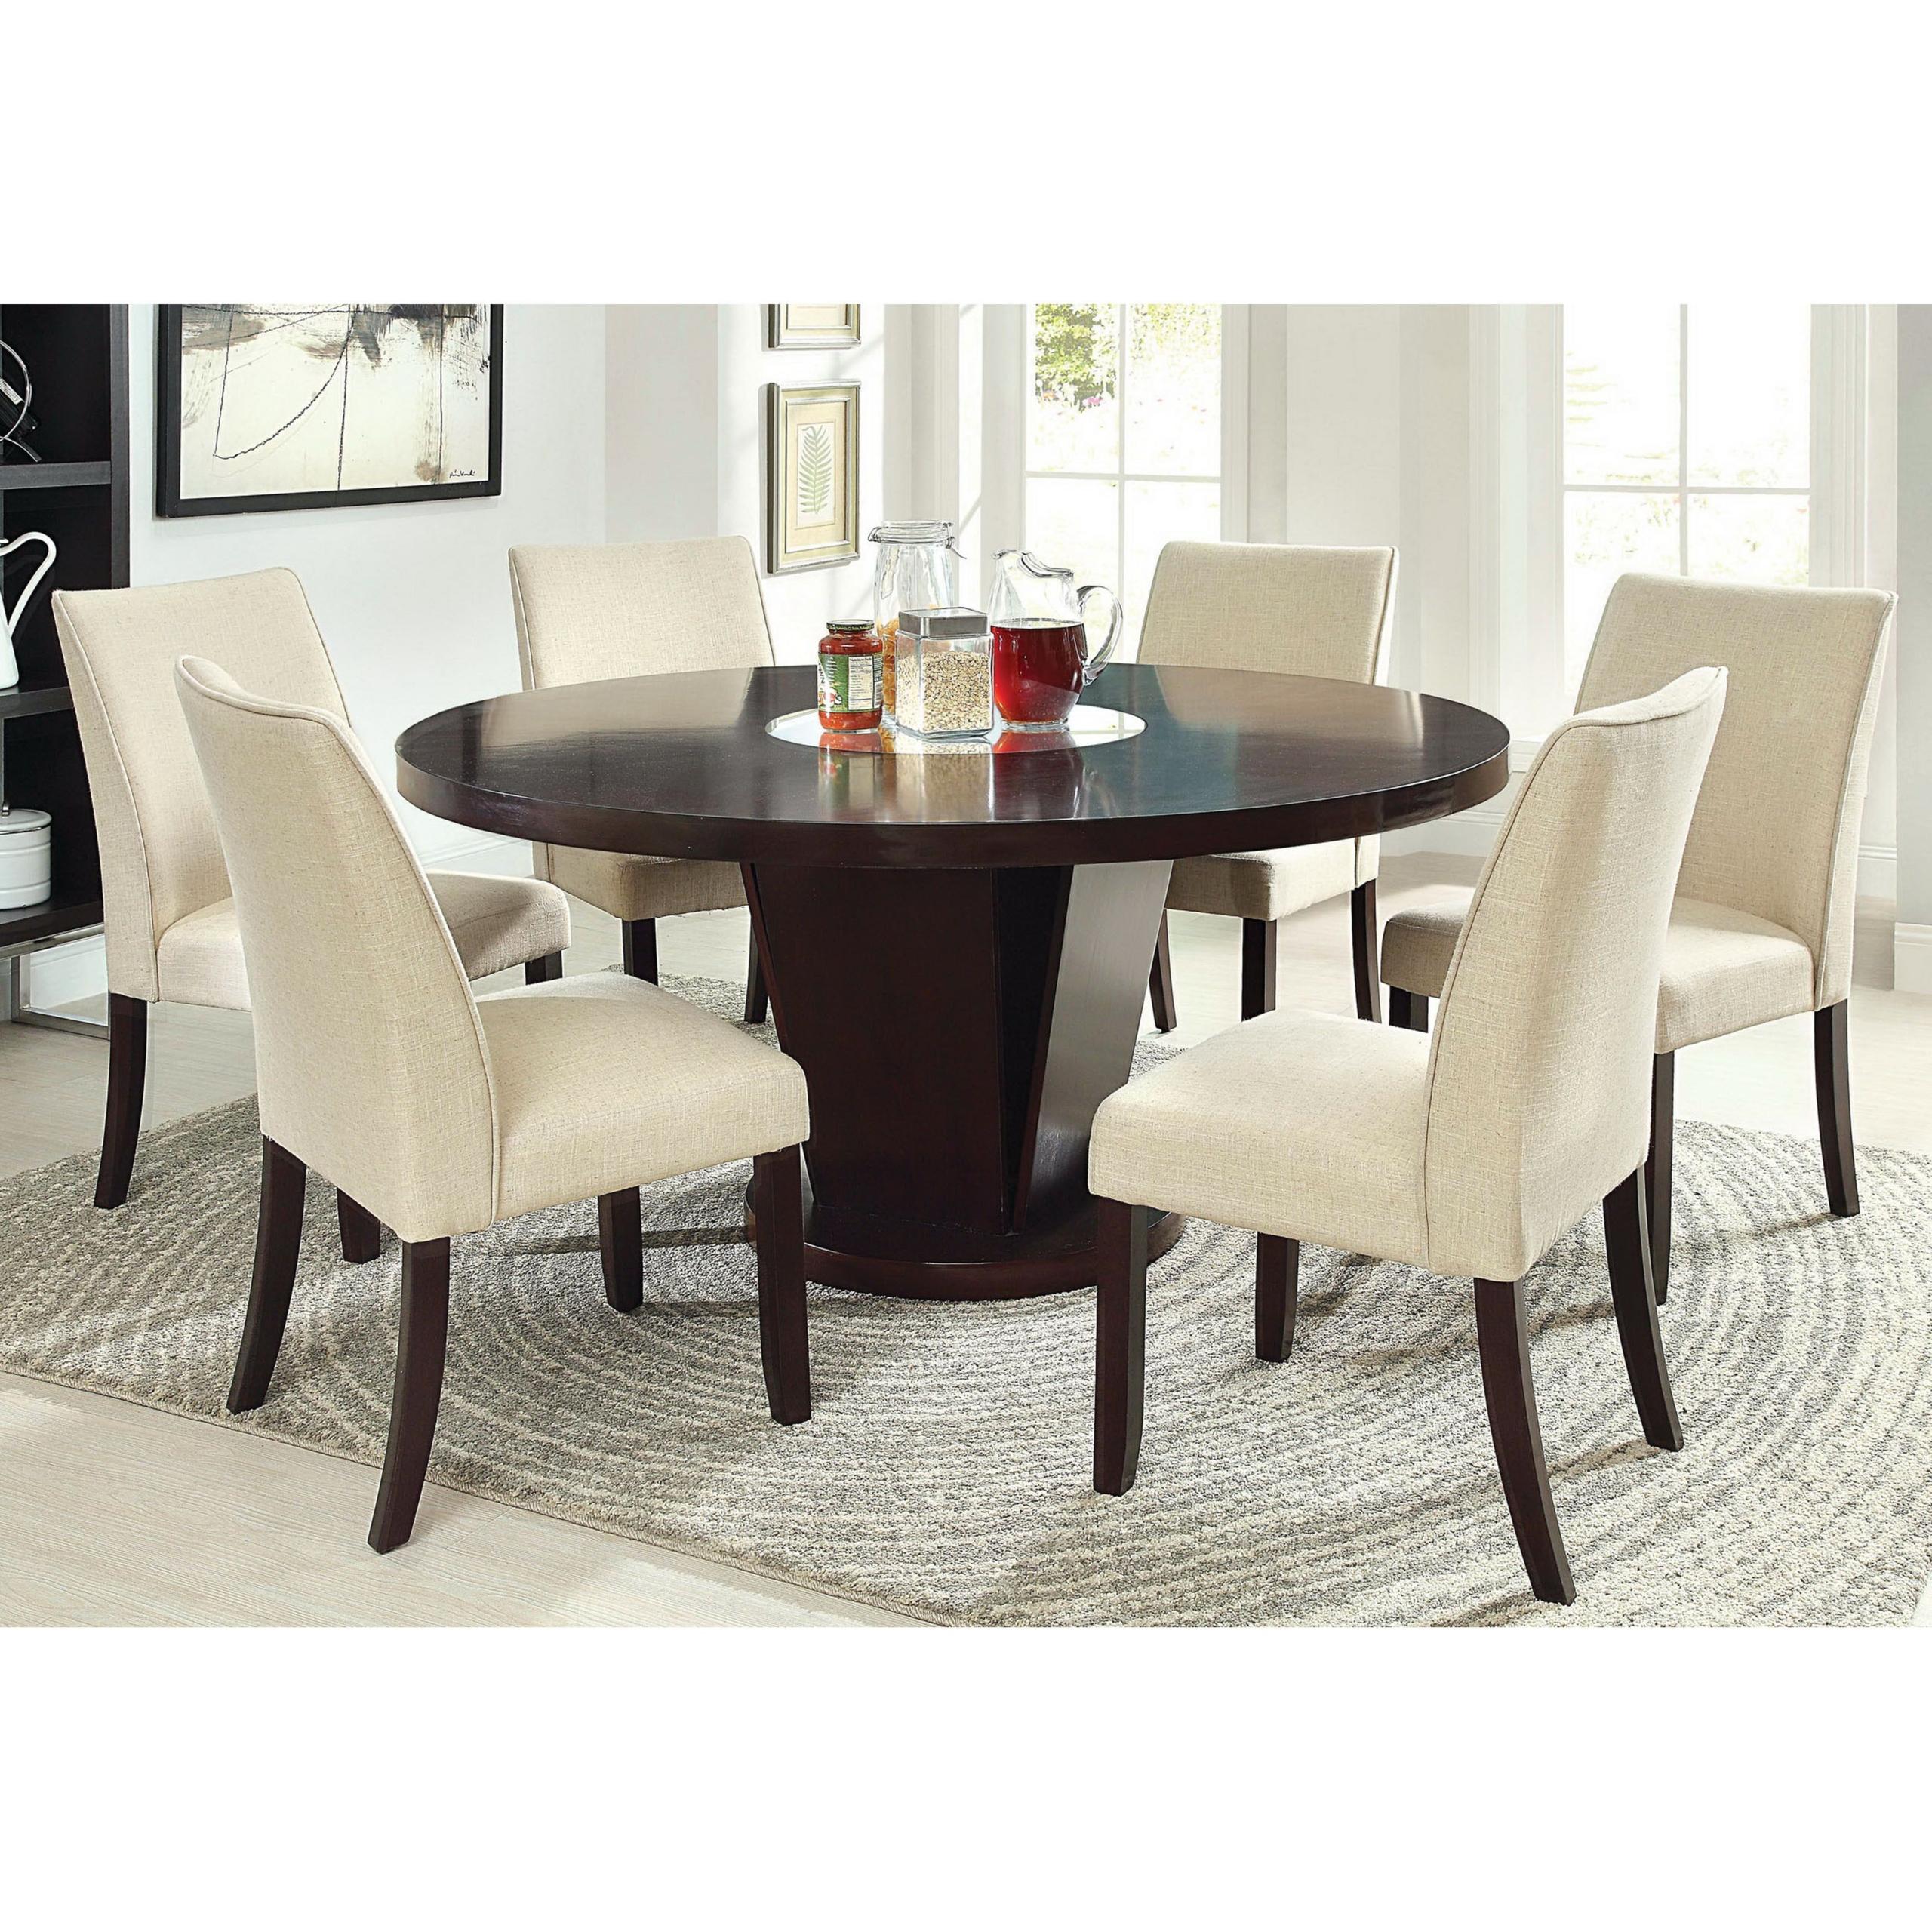 Elegant Furniture Of America Telstars Round Dining Table With Lazy Susan, Espresso Nice Ideas